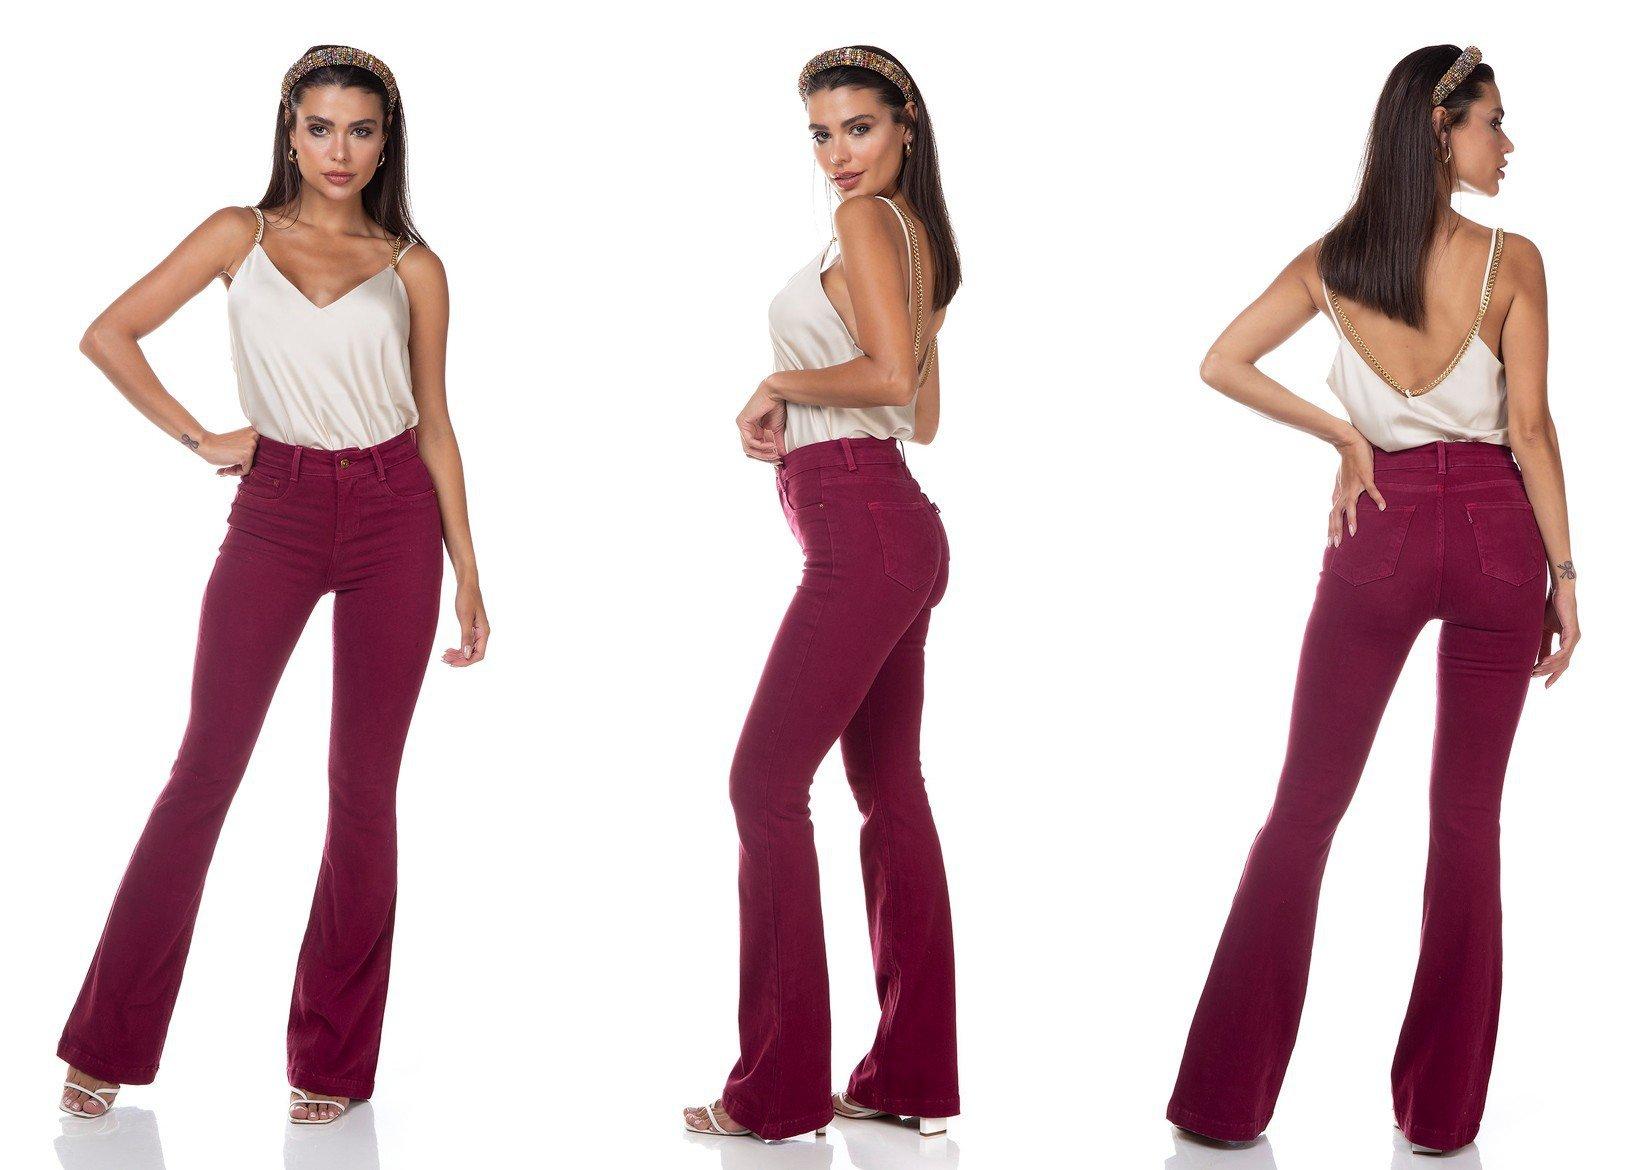 dz3308 calca jeans feminina flare media colorida maca do amor denim zero tripla